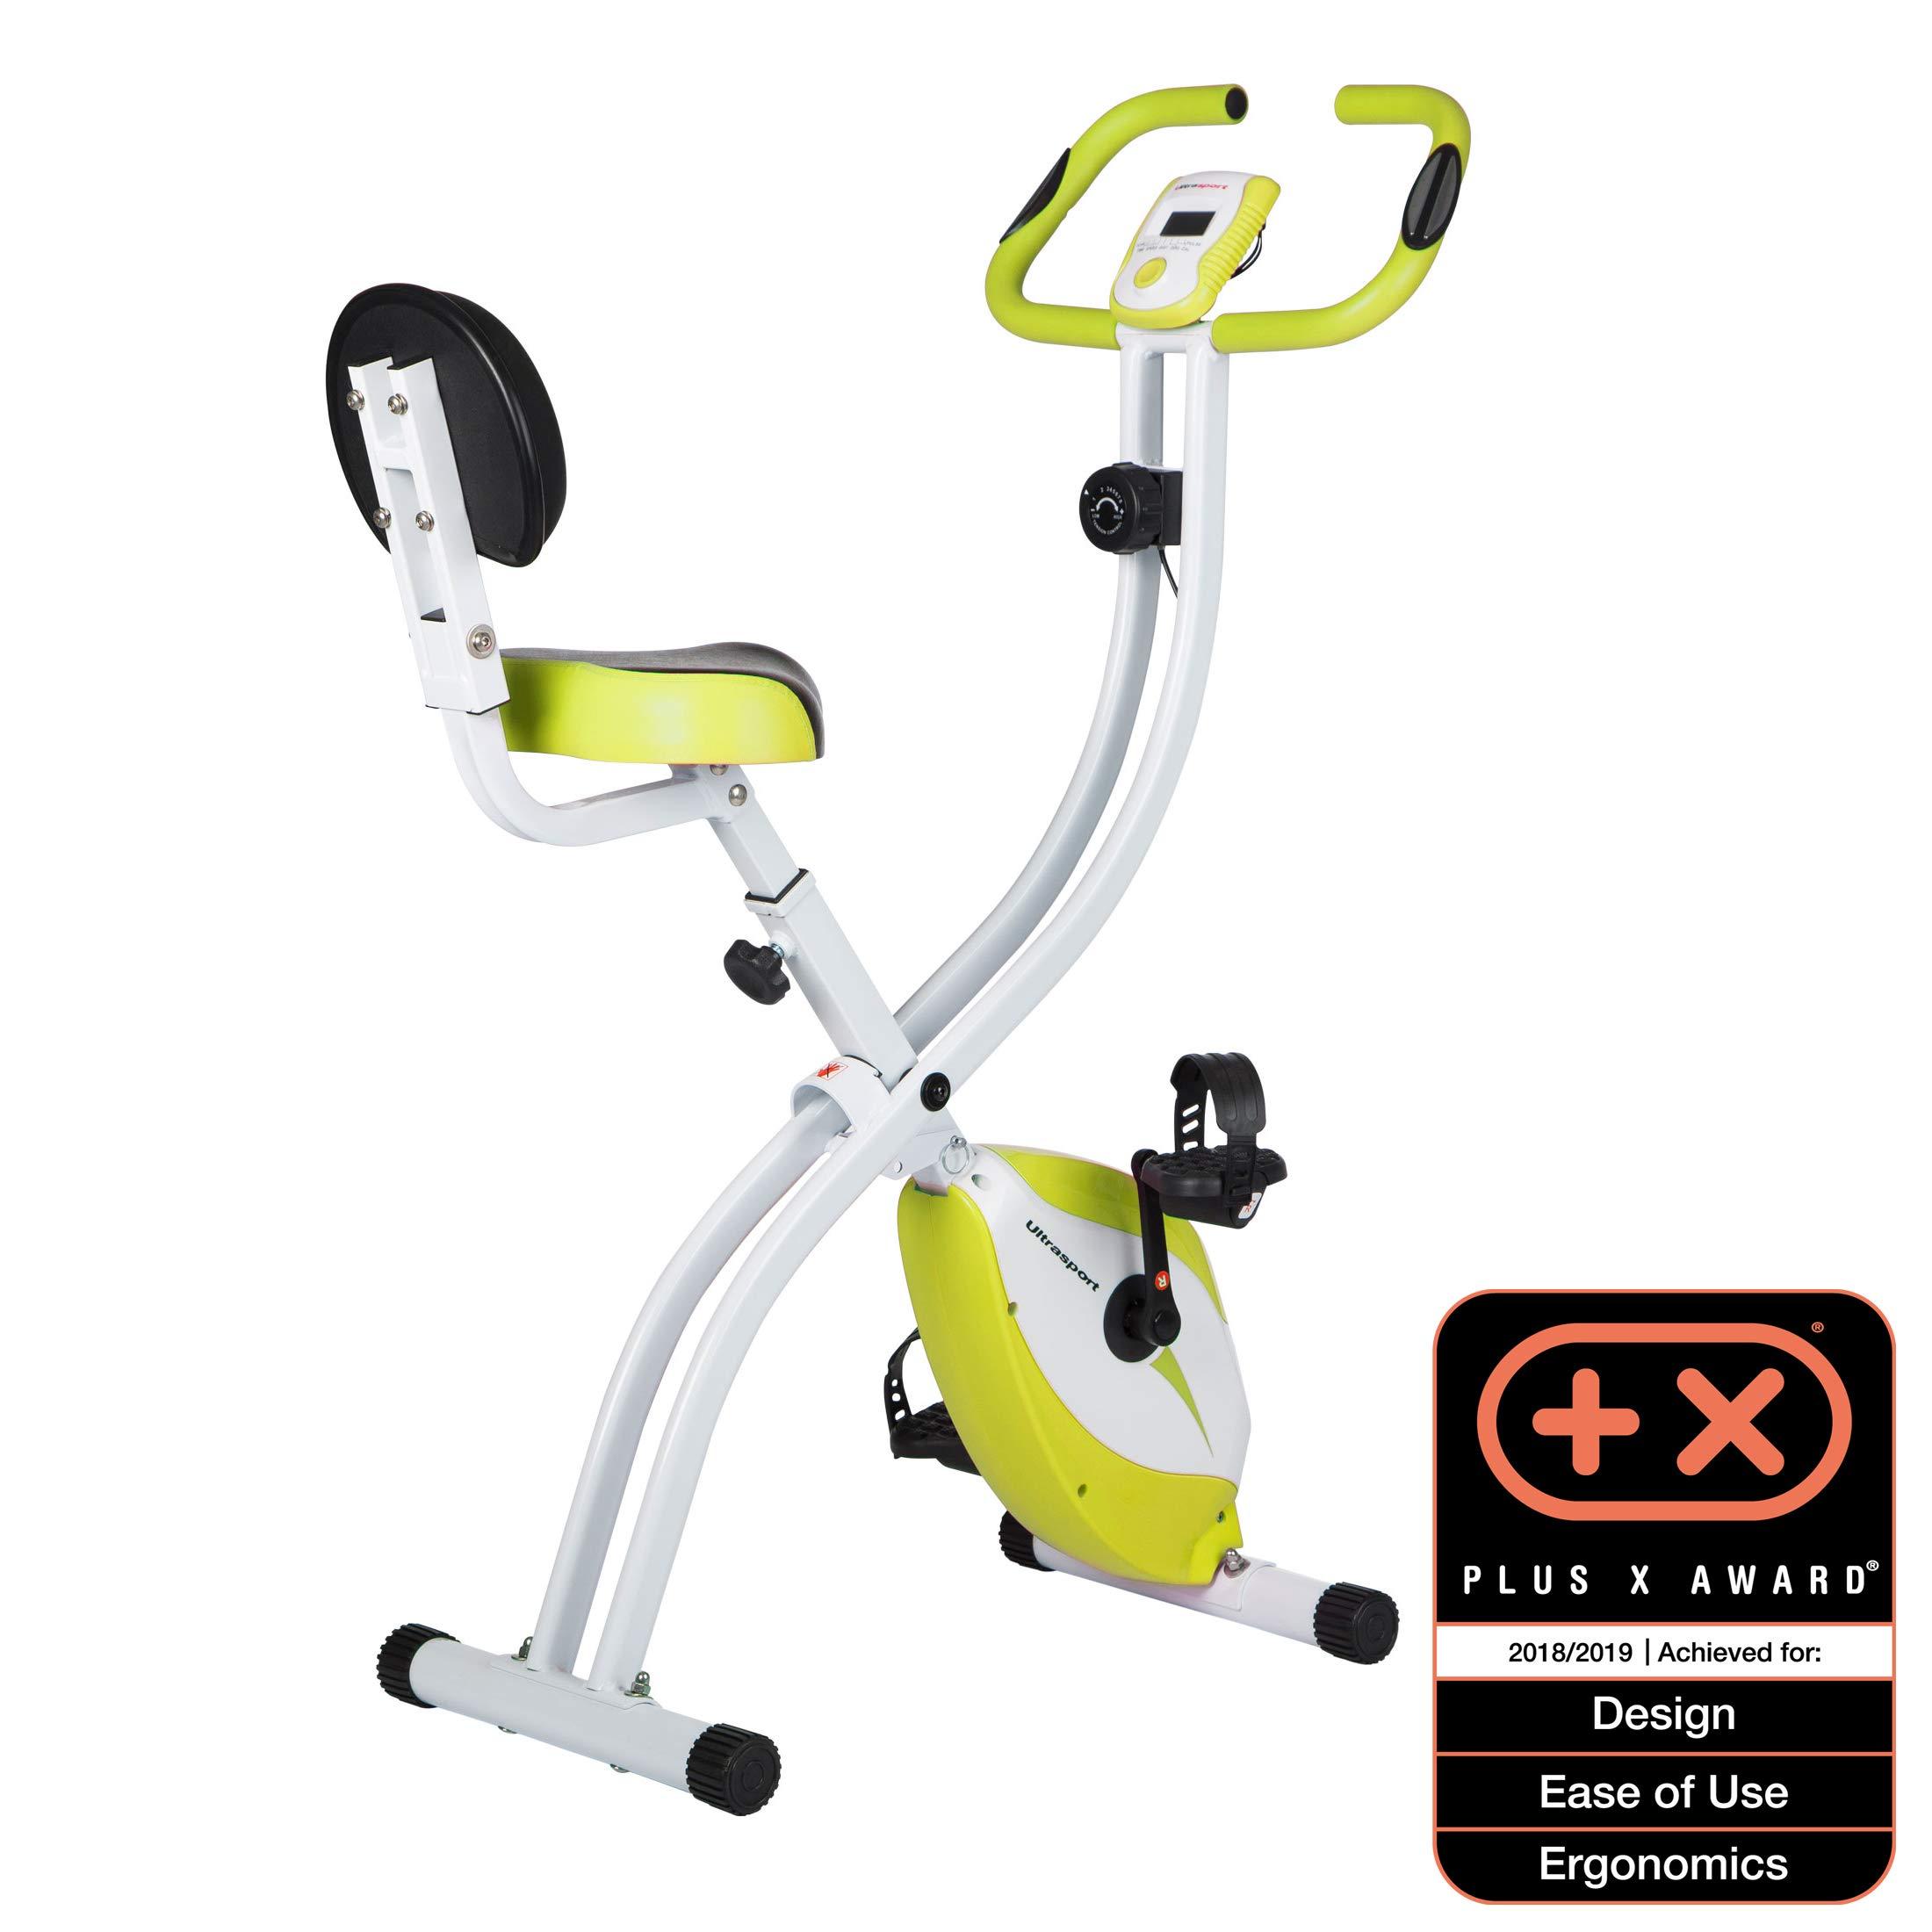 Ultrasport F-Bike 200B Bicicleta estática con sensores de pulso de mano, con respaldo, plegable, Verde product image